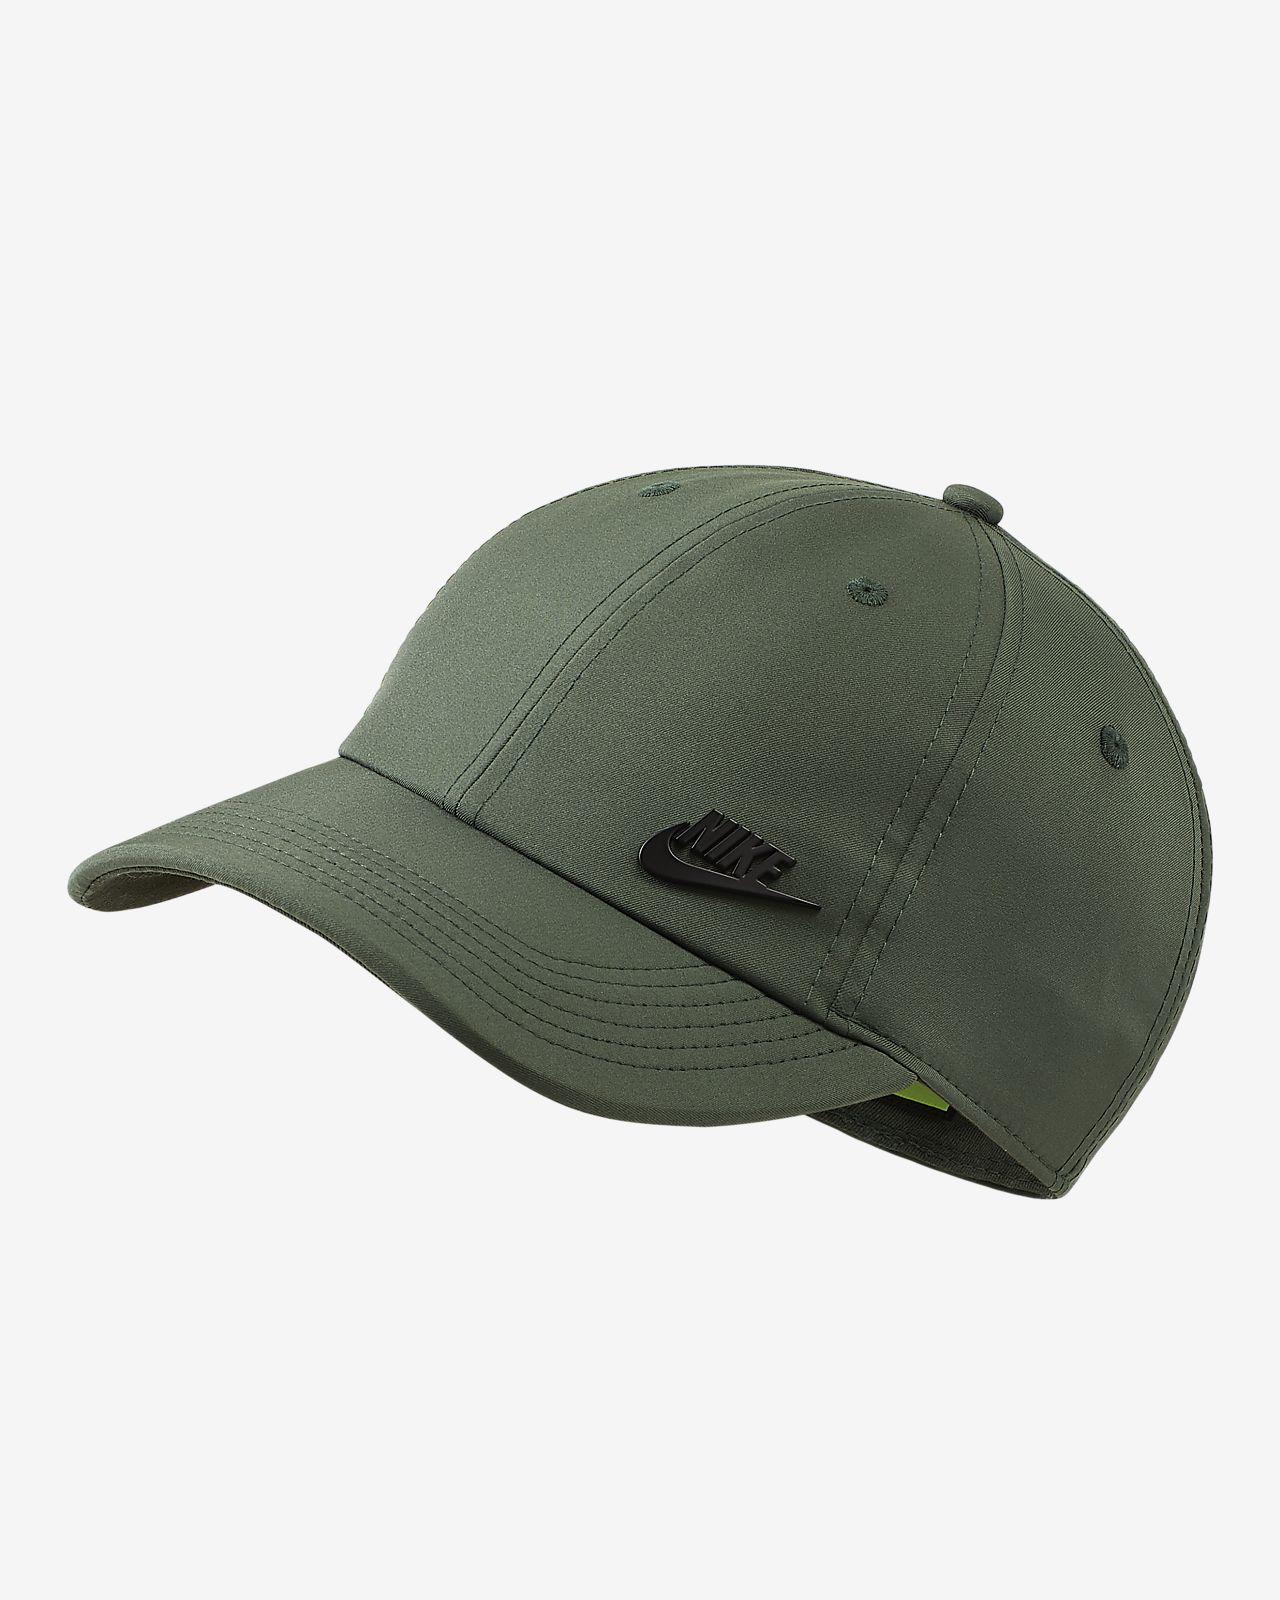 940f43e06 Nike Sportswear Futura Heritage 86 Adjustable Hat